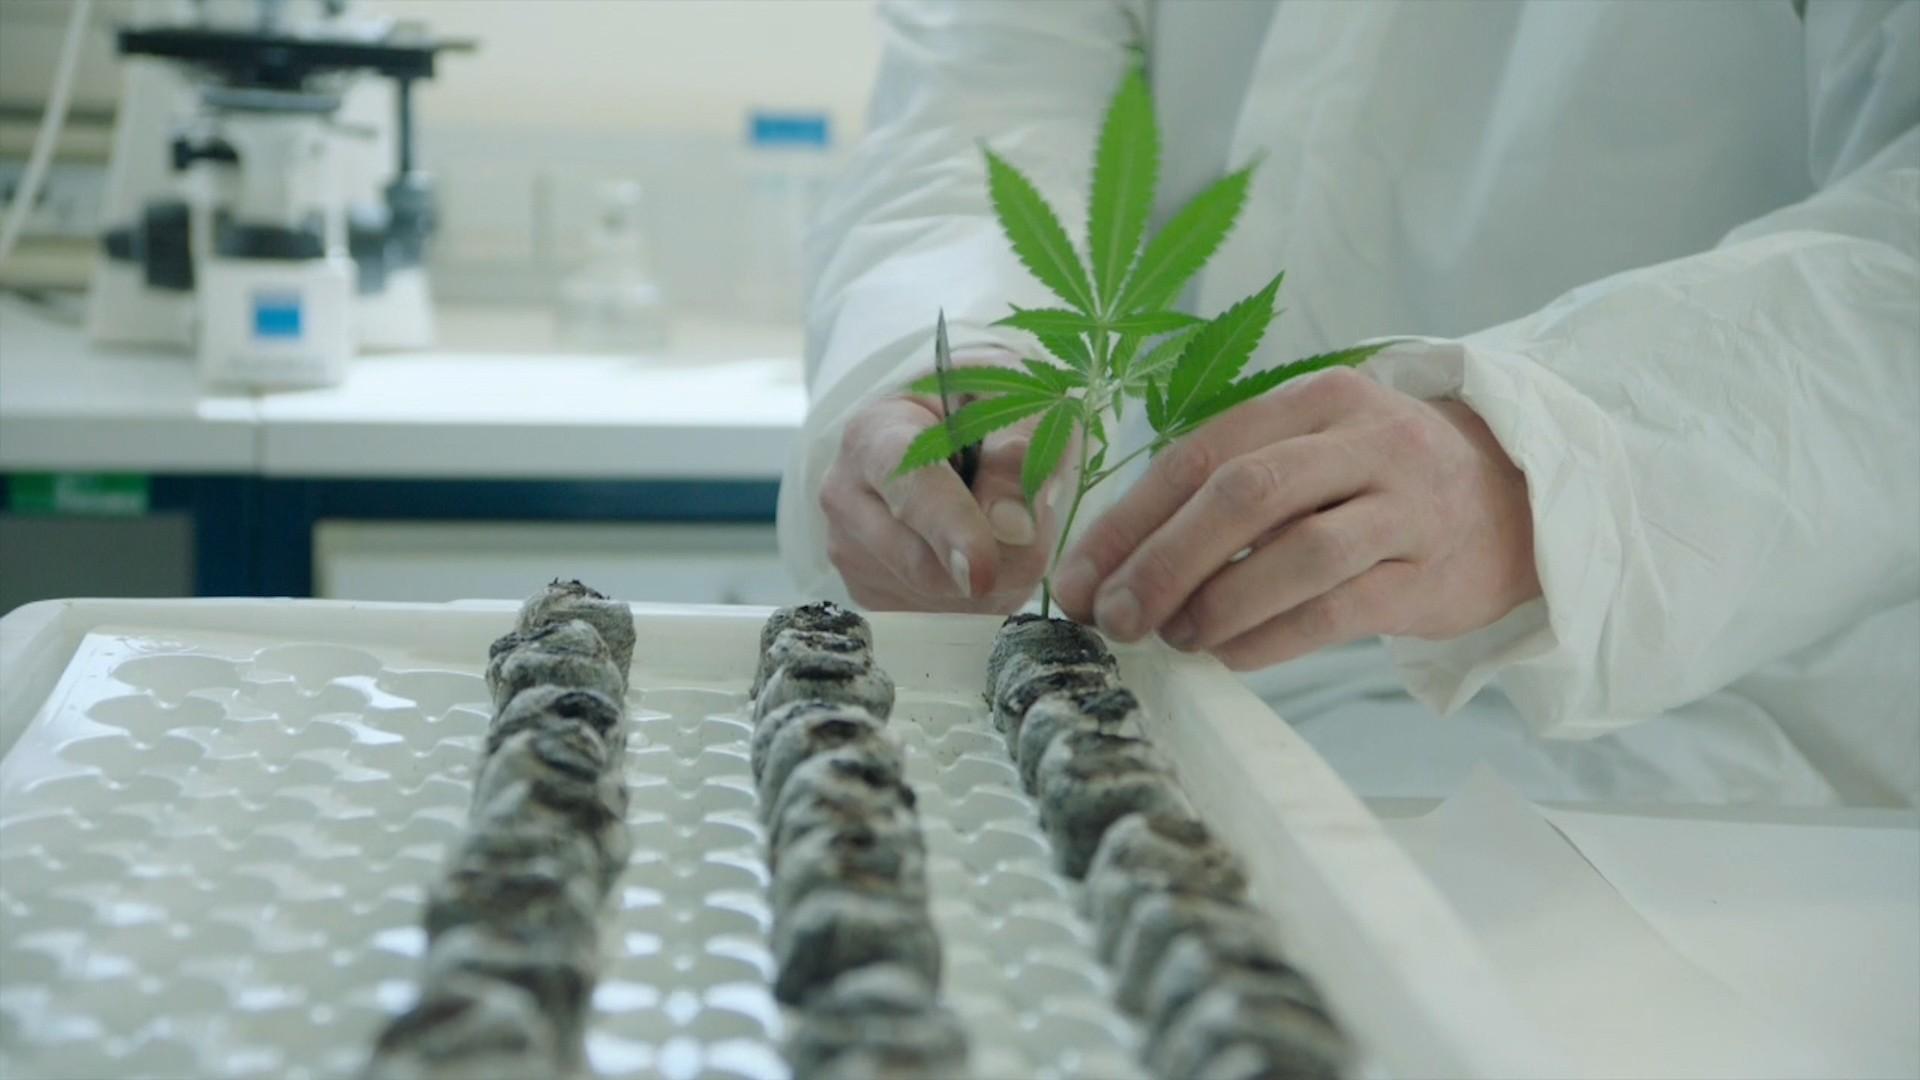 Cannabis: Droge und Medizin - Teil 2